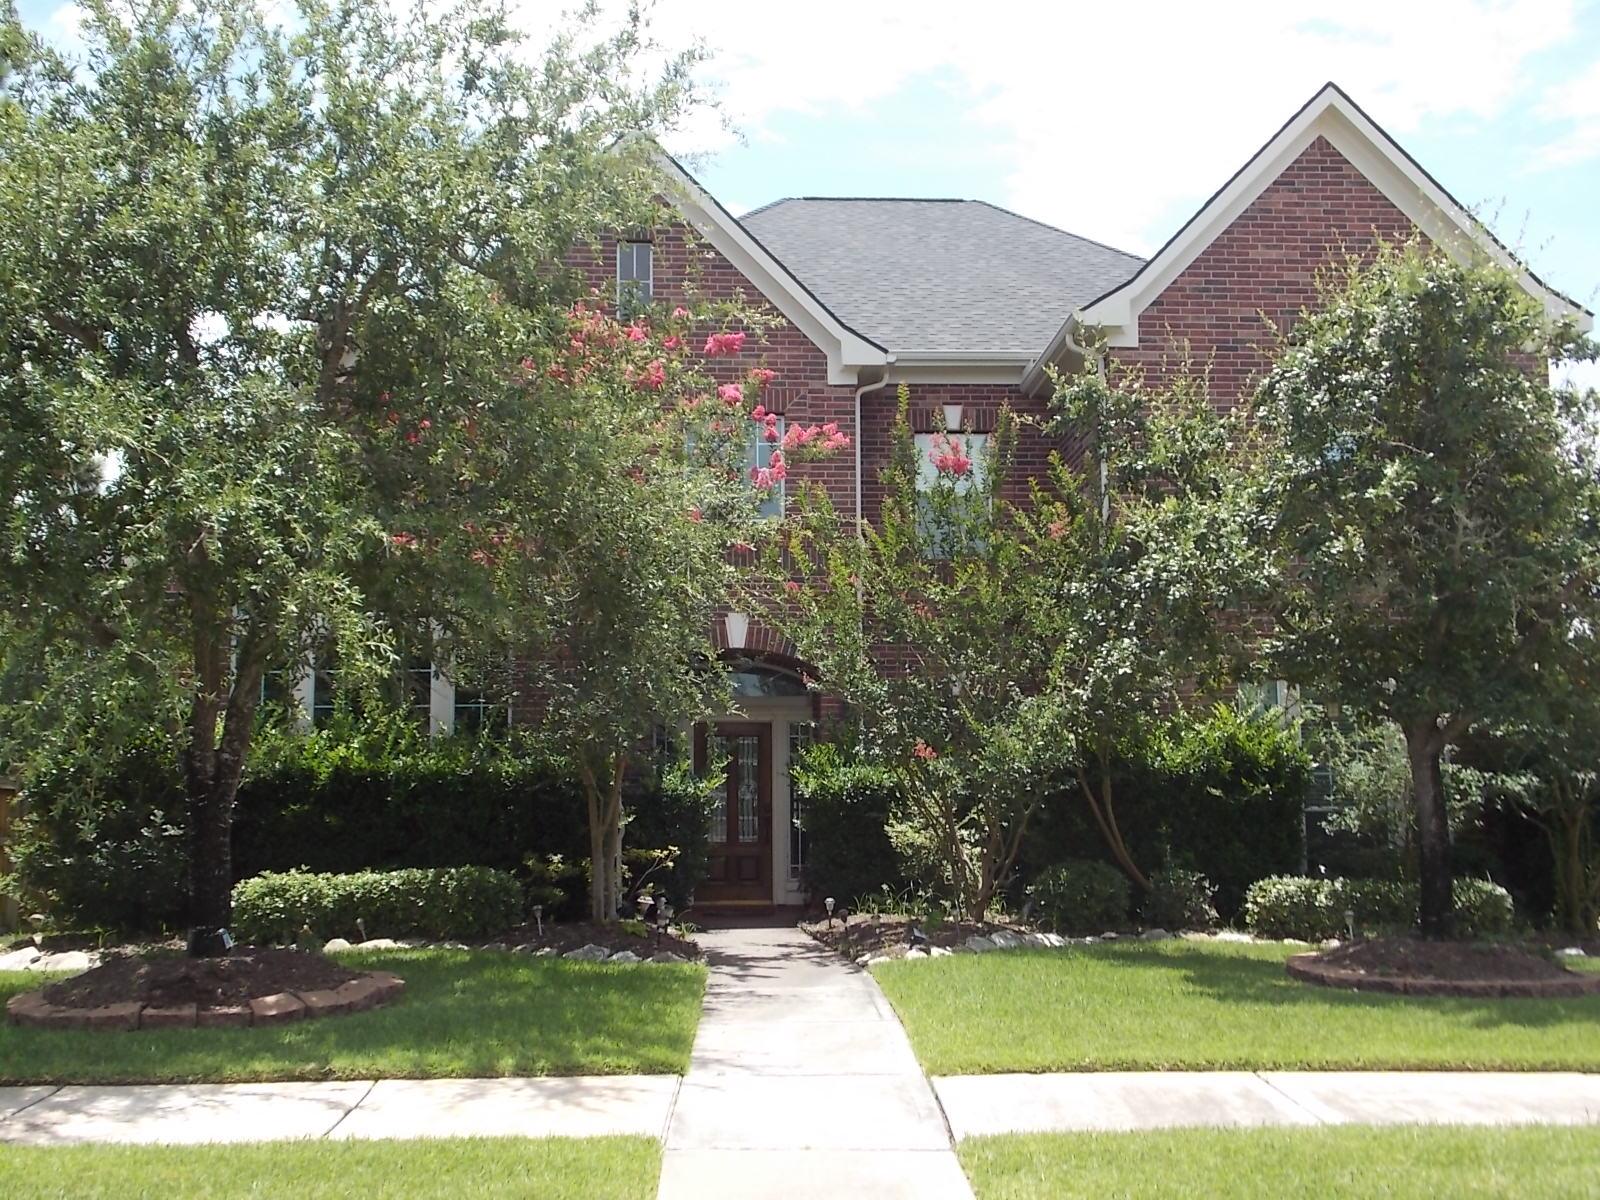 The Katy Texas Blog Grand Lakes Katy Homes For Sale June 25 2013